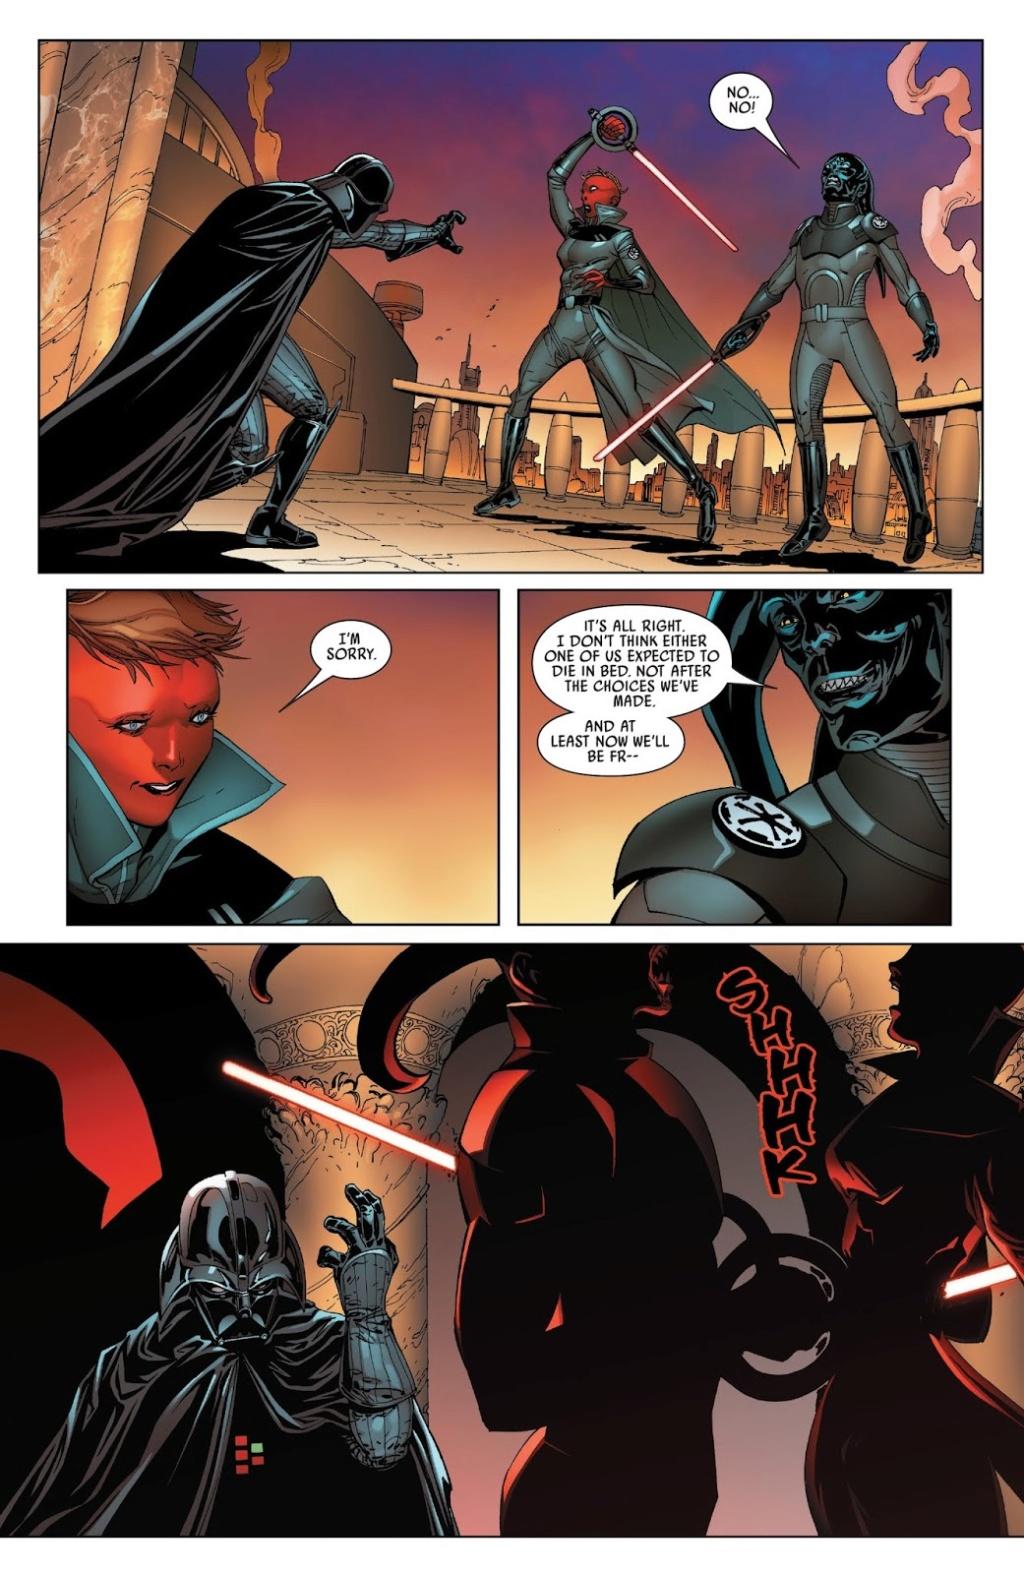 SS - Darth Maul (IG) vs. Darth Vader (BreakofDawn) Rco01210